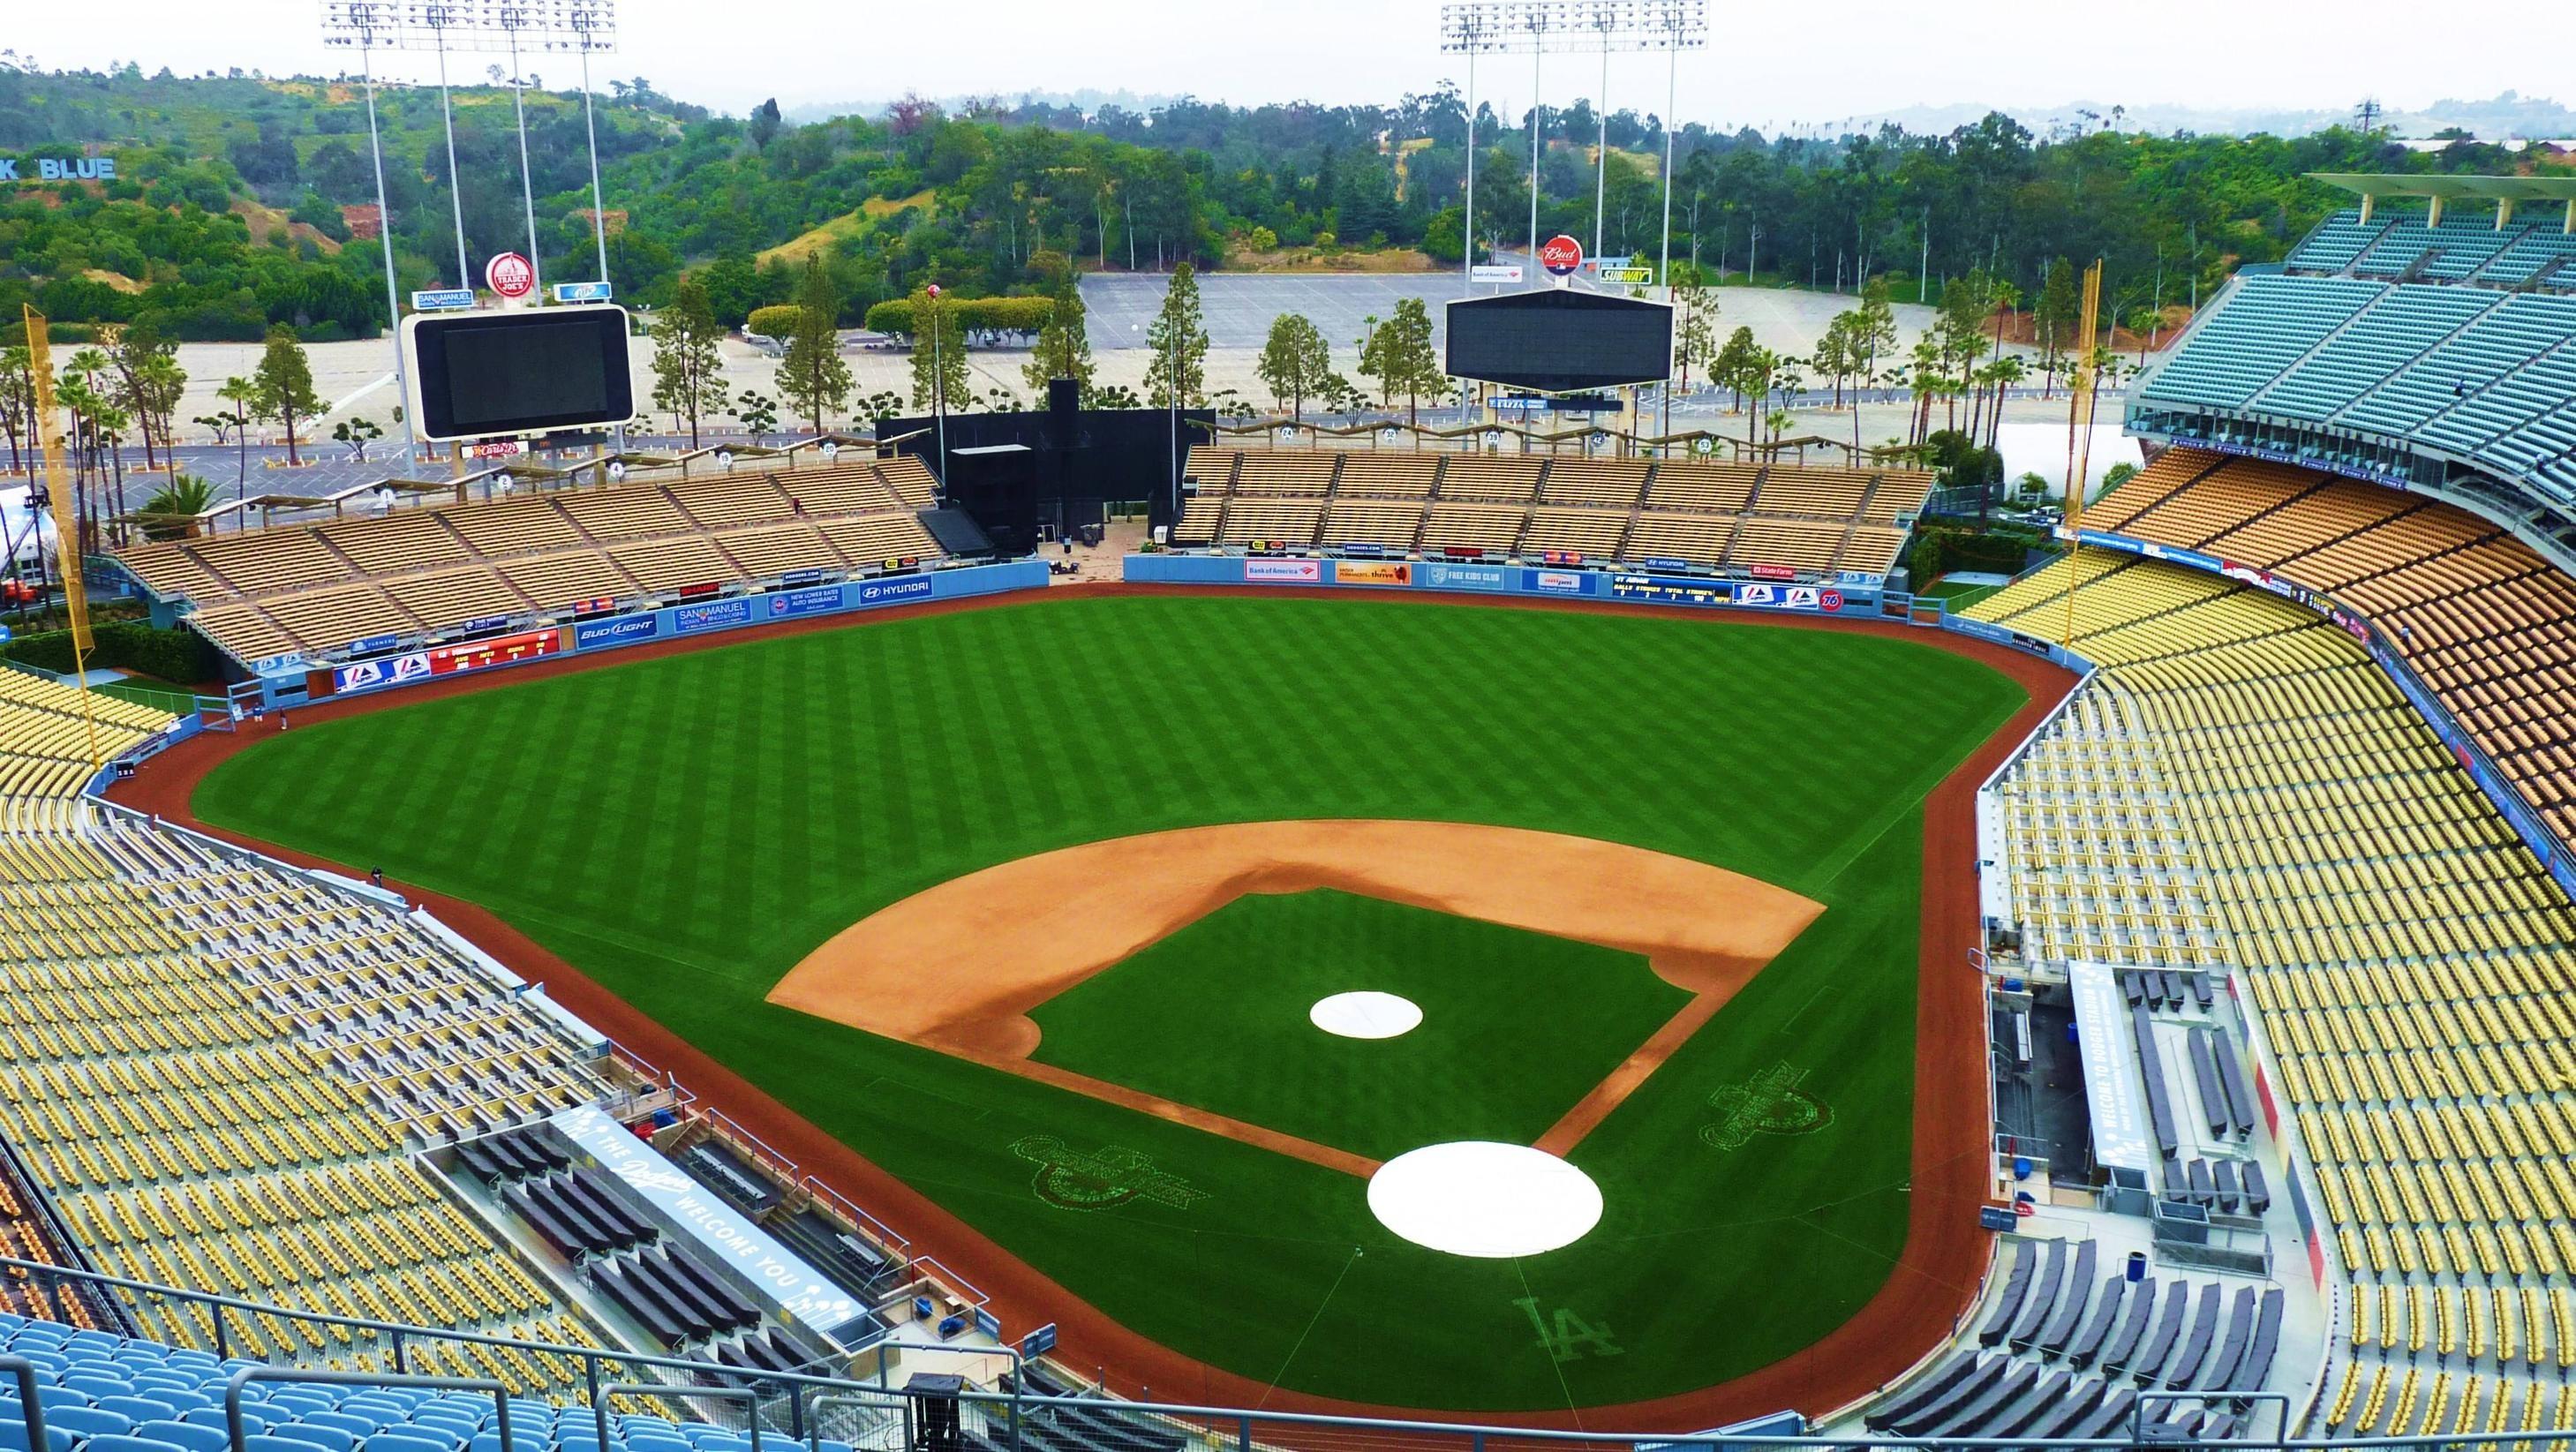 wallpaper.wiki-Dodger-Stadium-Pictures-PIC-WPB009269